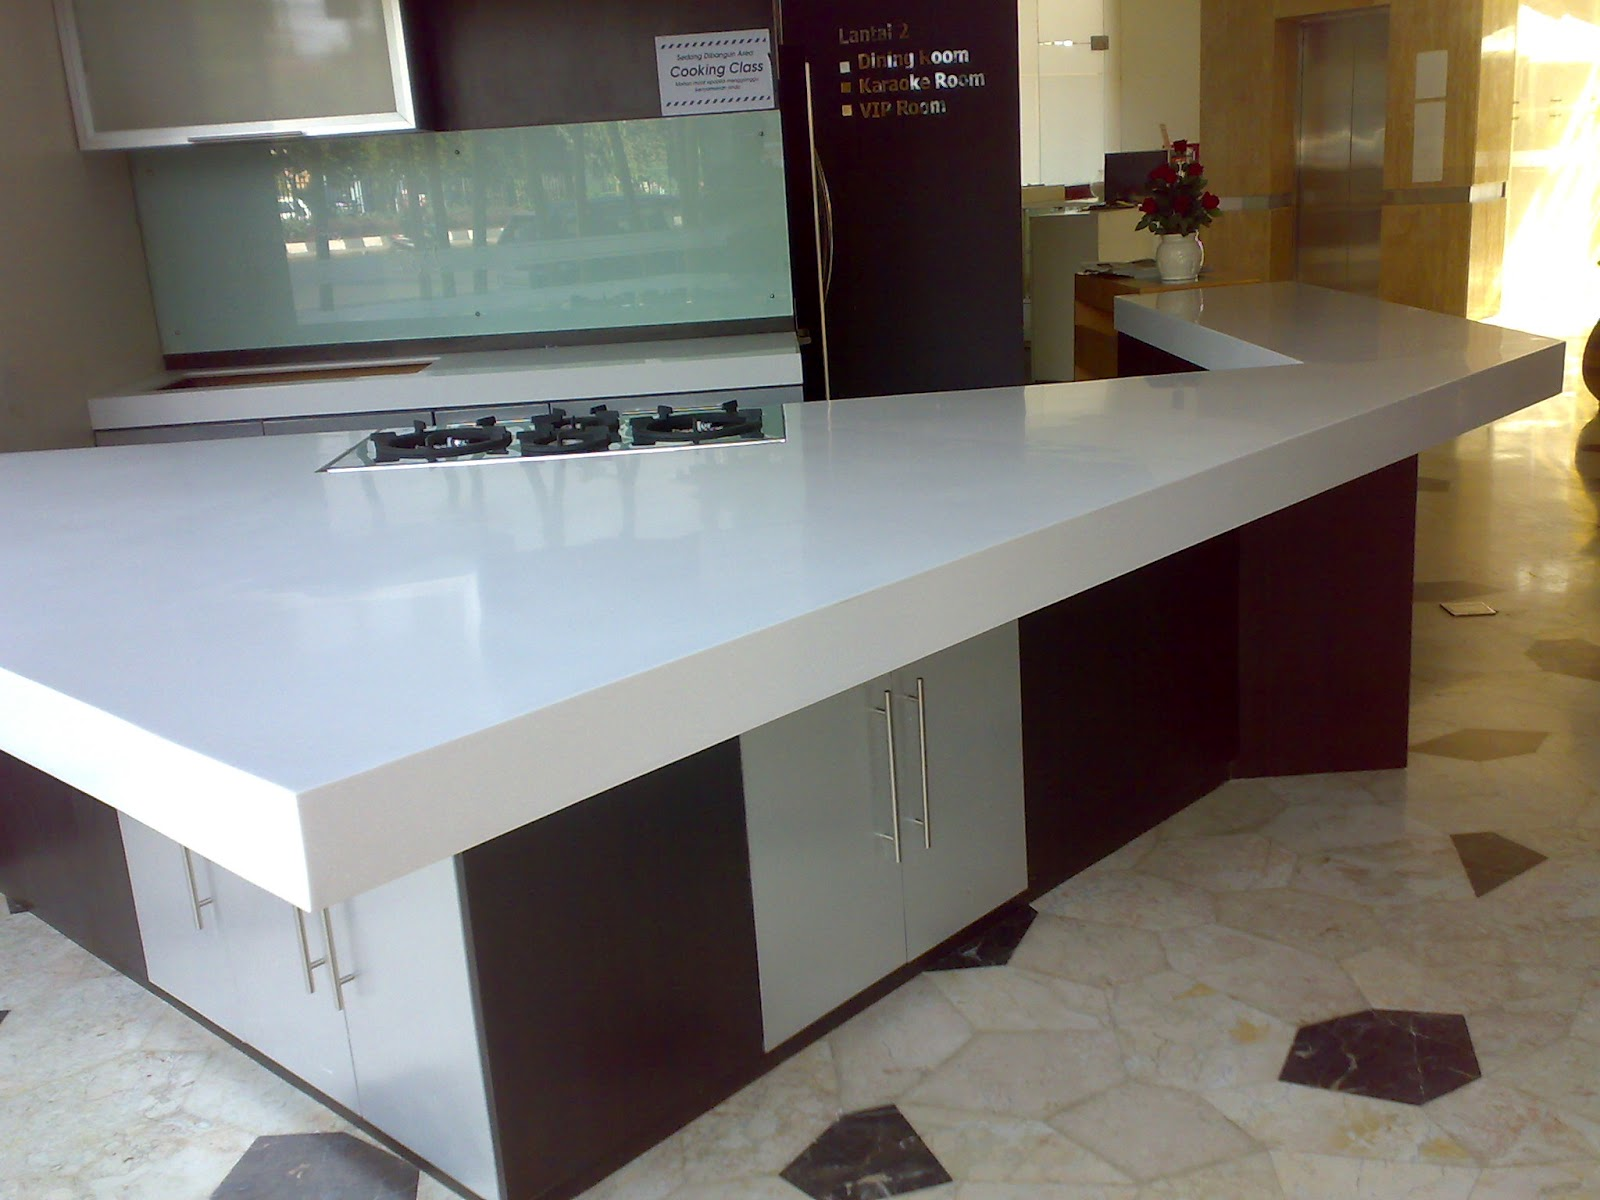 Alasan kitchen set harus menggunakan batu granit sintetis for Harga granit untuk kitchen set